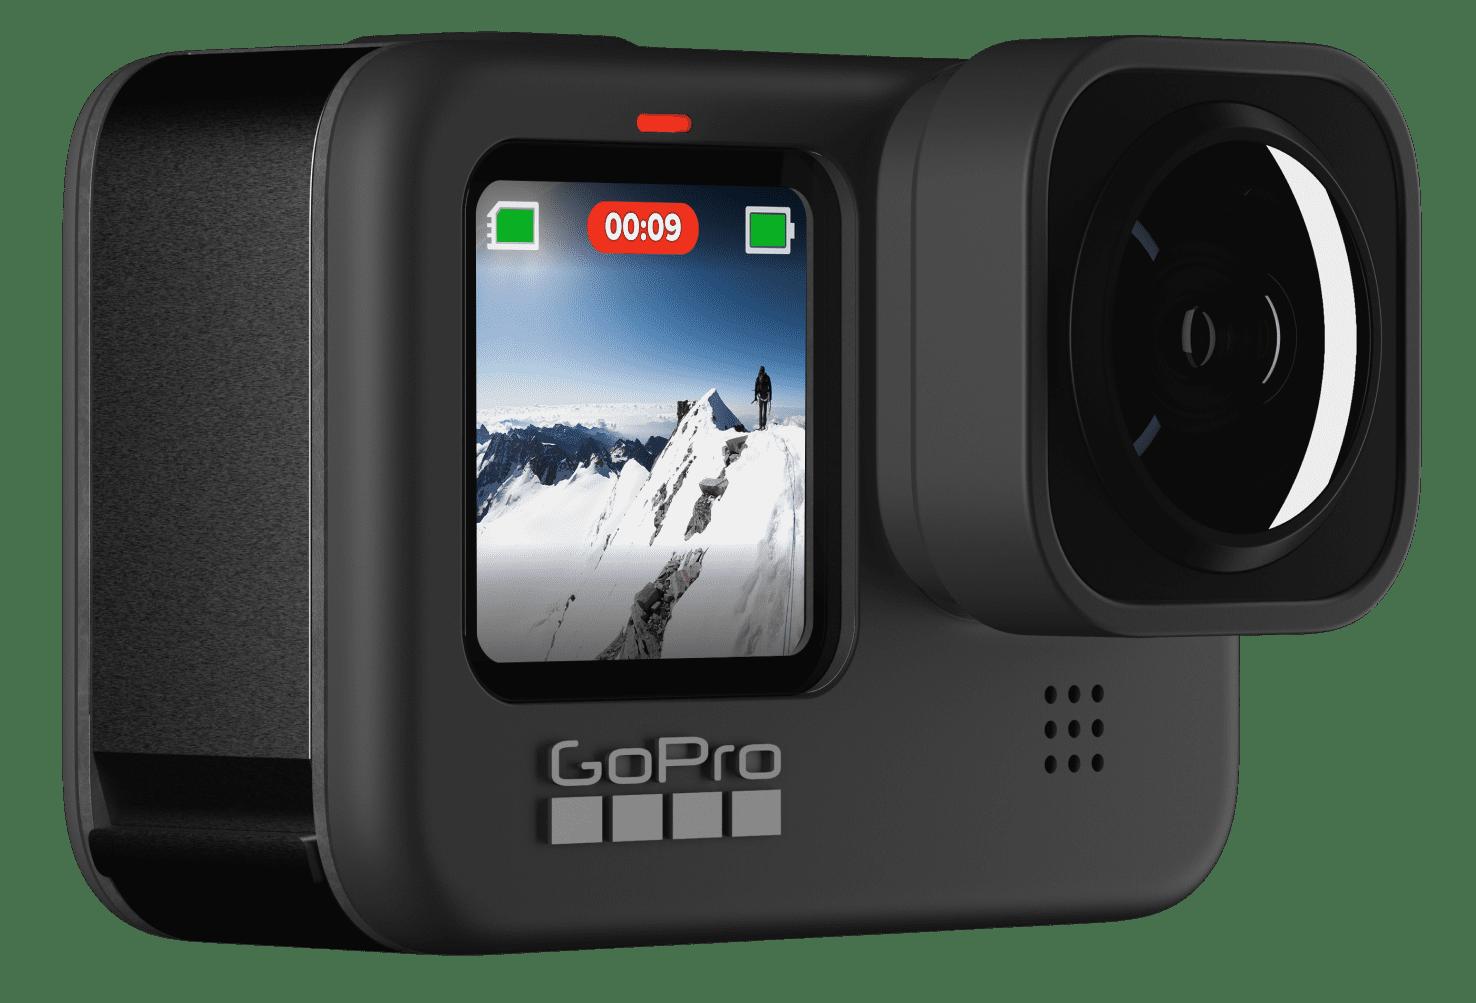 hero9-black-max-lens-mod-left-image